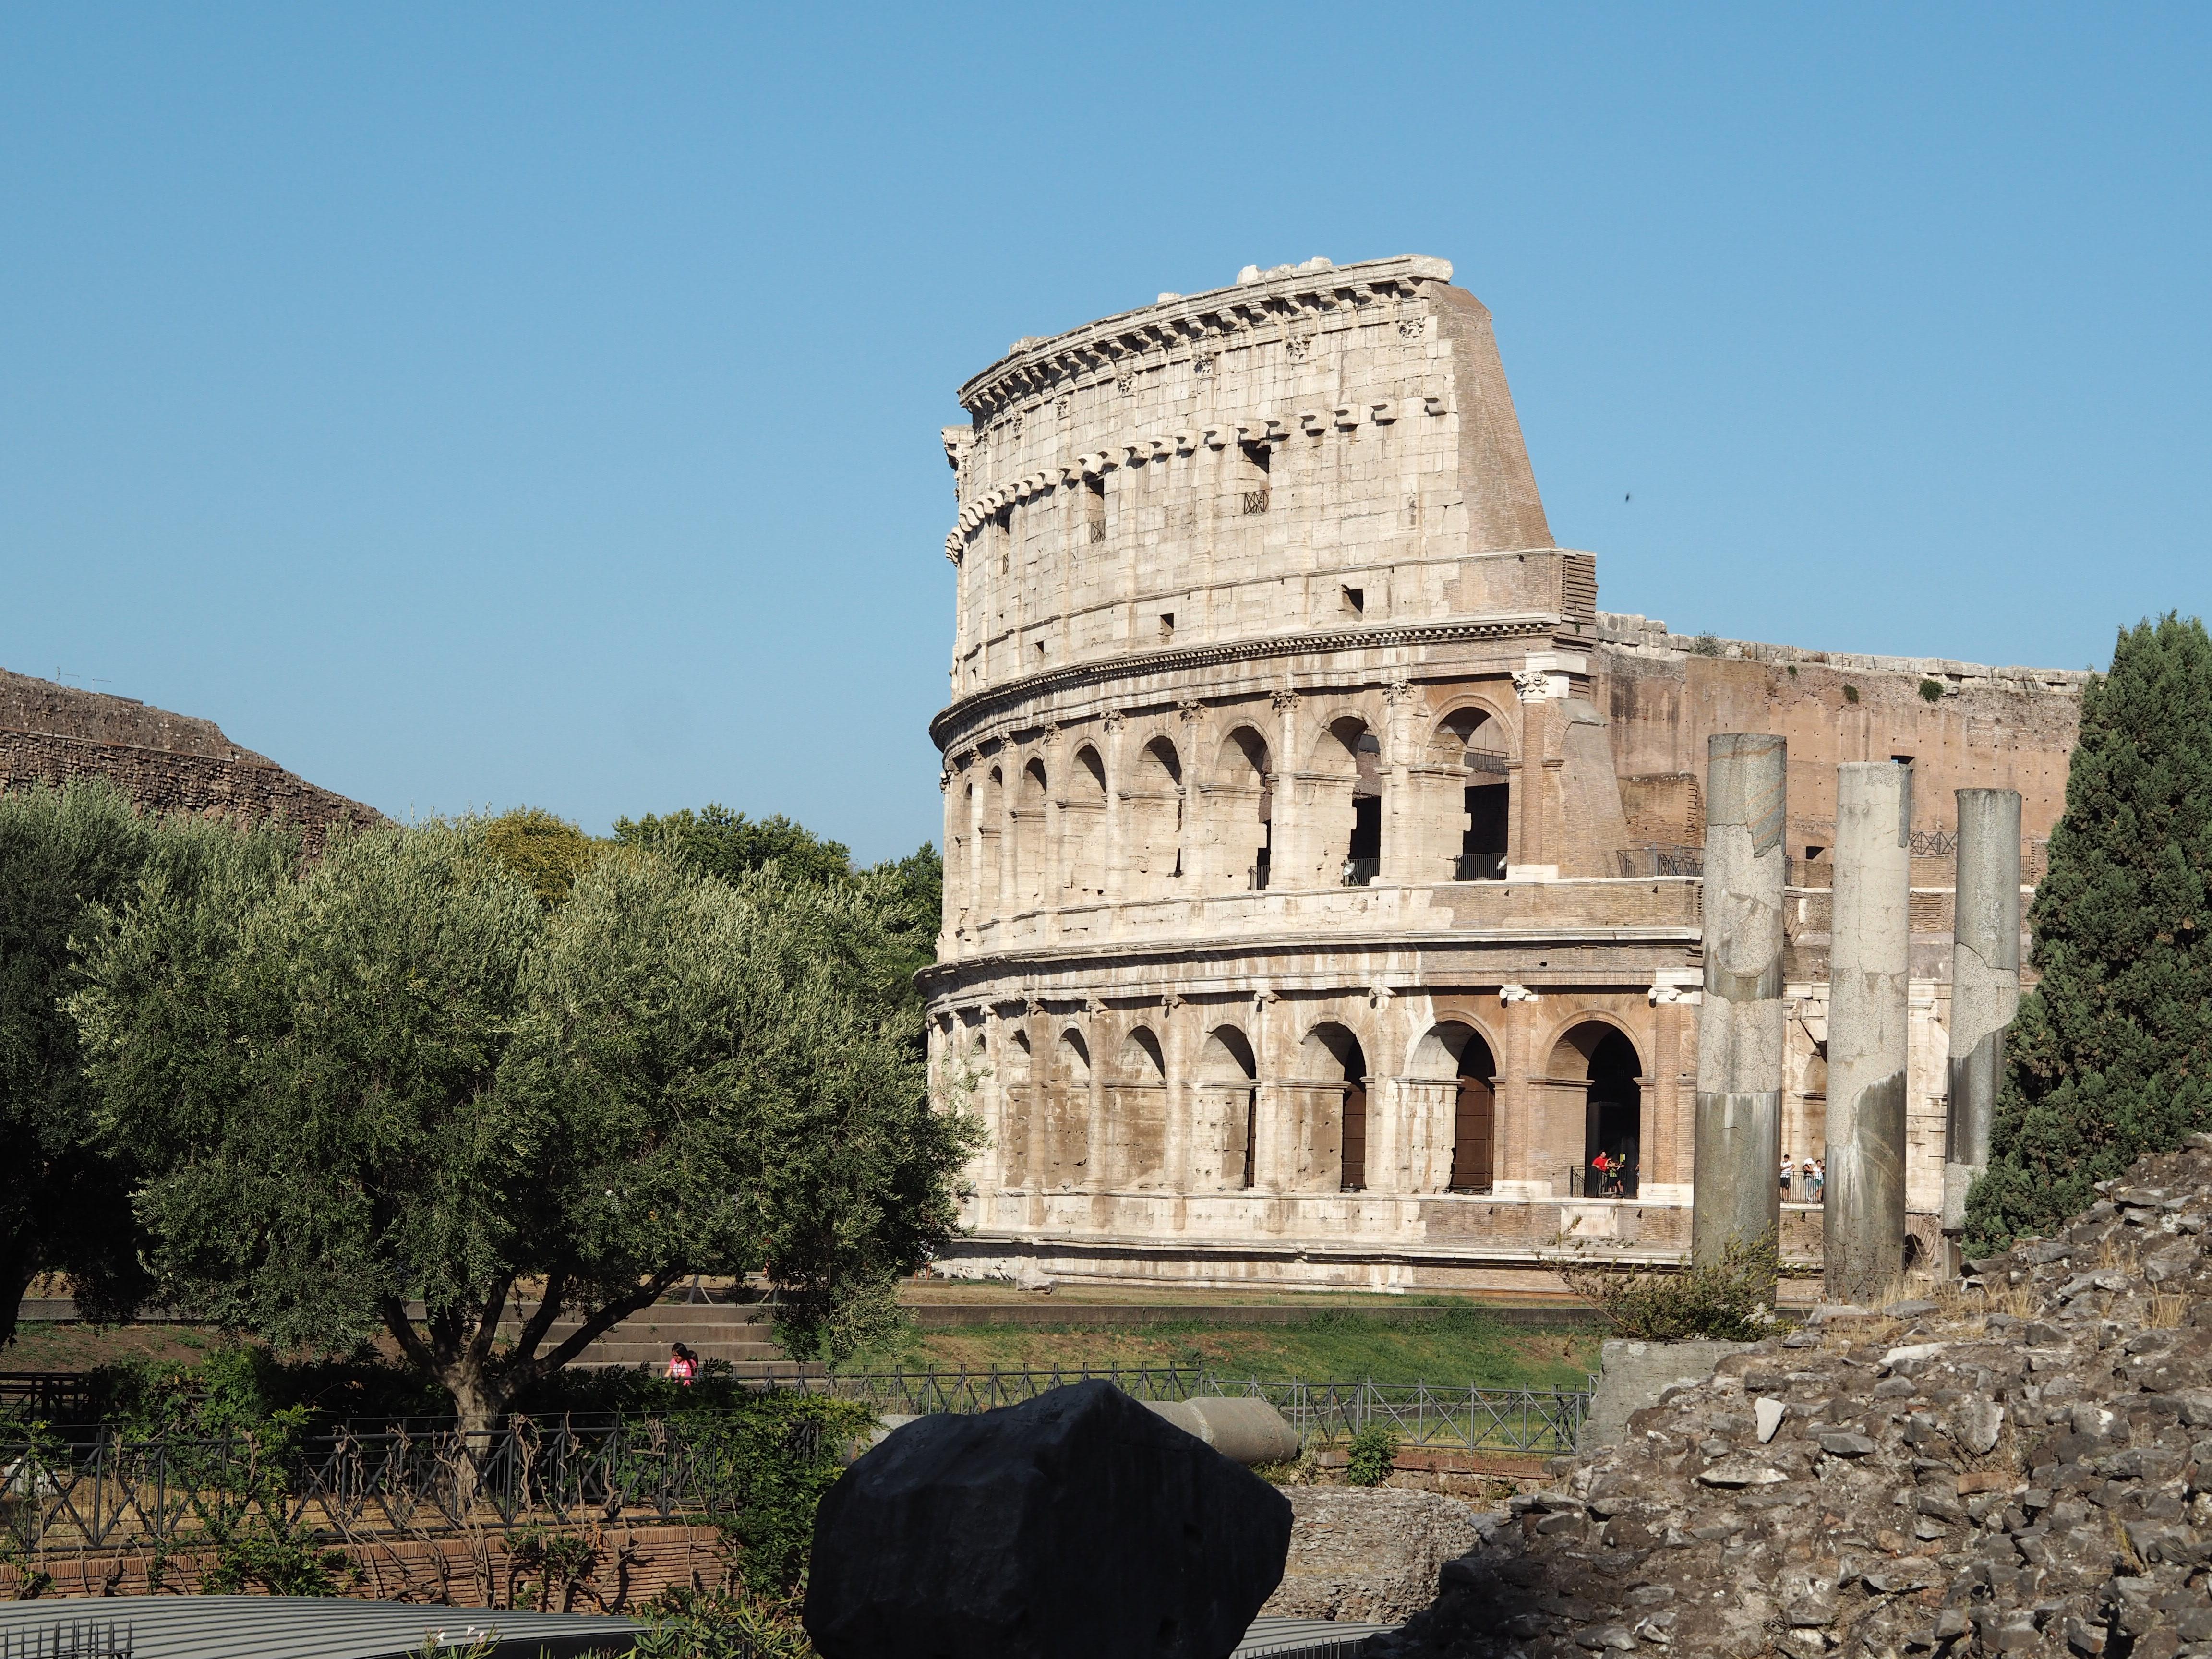 Interrail – Traveldiary #6 (Carcassonne, Avignon, Marseille, Cannes, Nizza, Genua, Mailand, Florenz, Rom, Venedig)